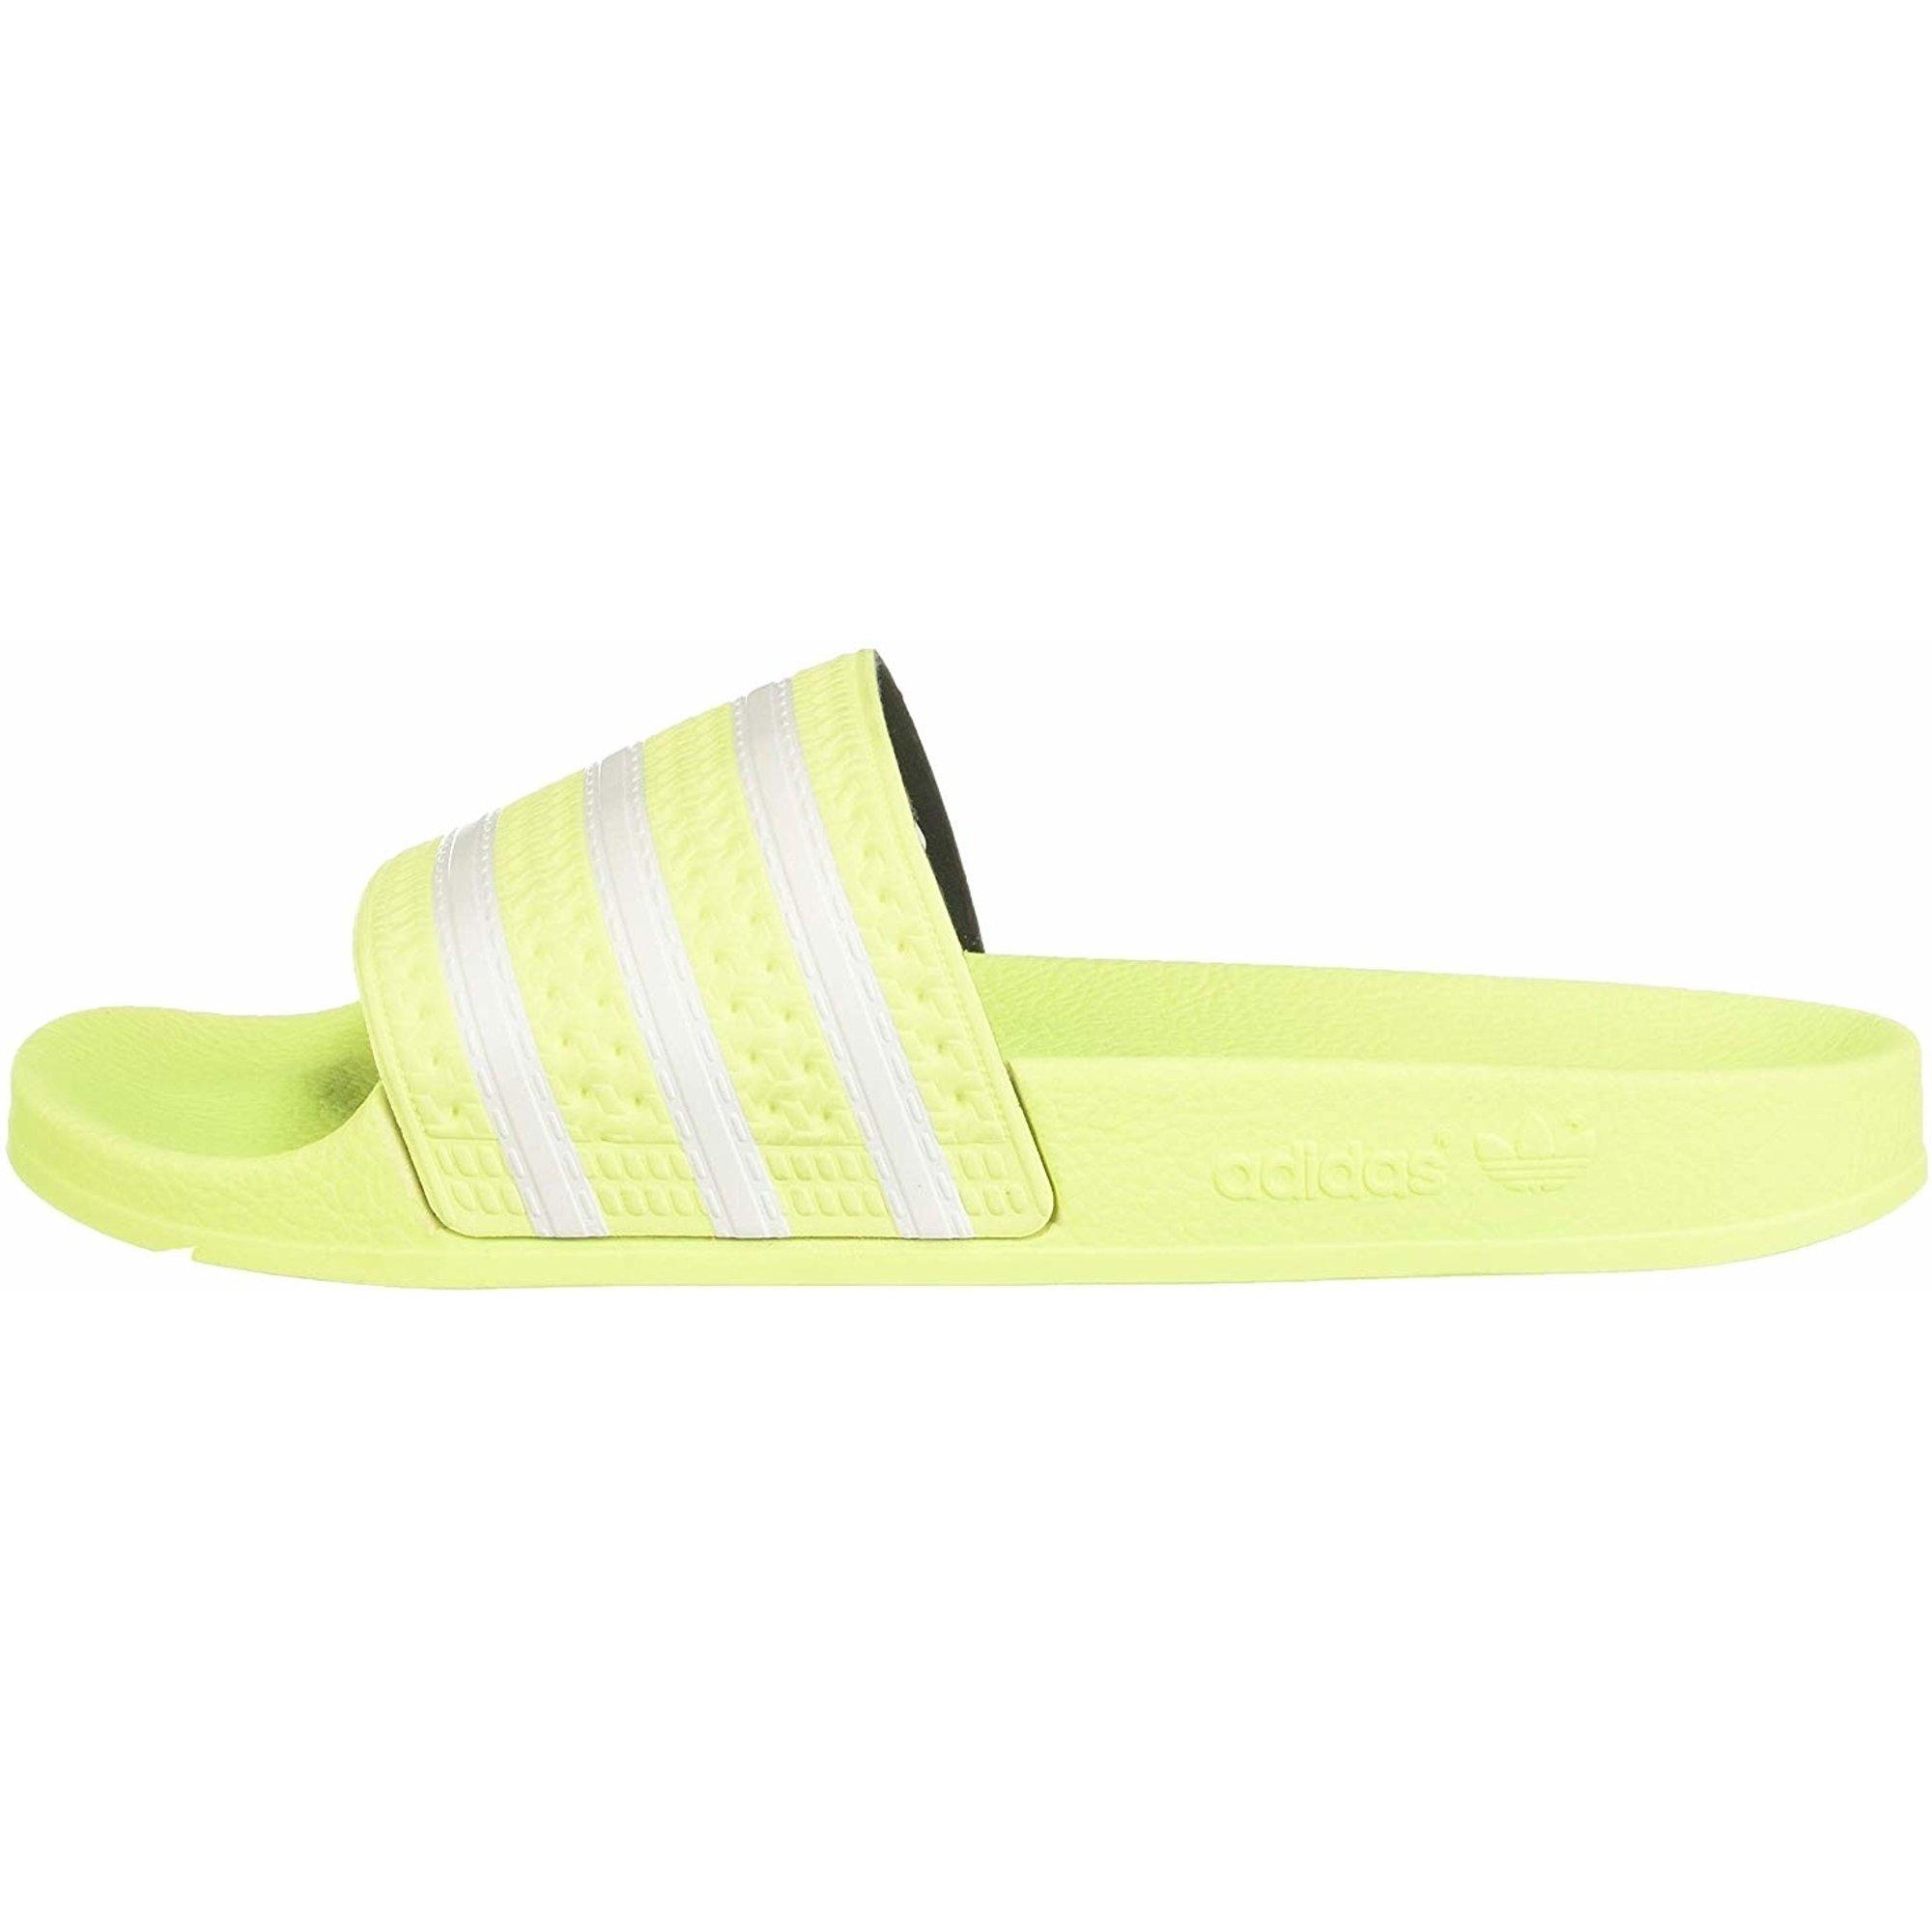 adidas Originals adilette Halbgefrorenes Gelb Synthetik Erwachsene